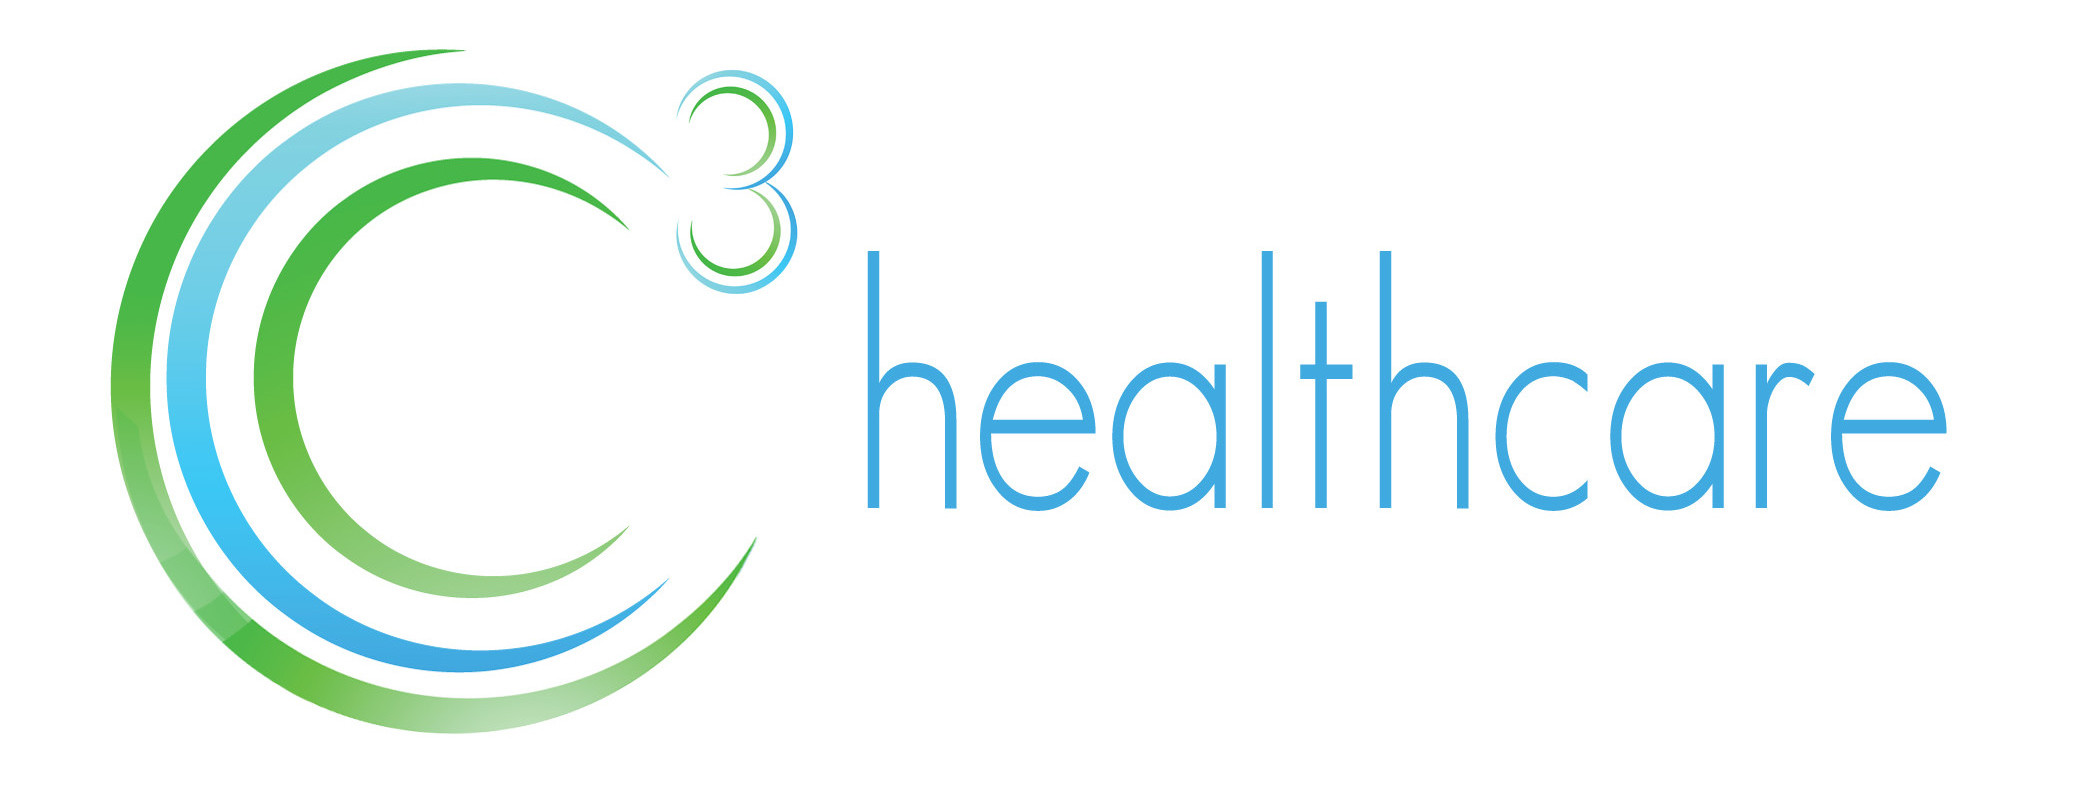 C3 Healthcare